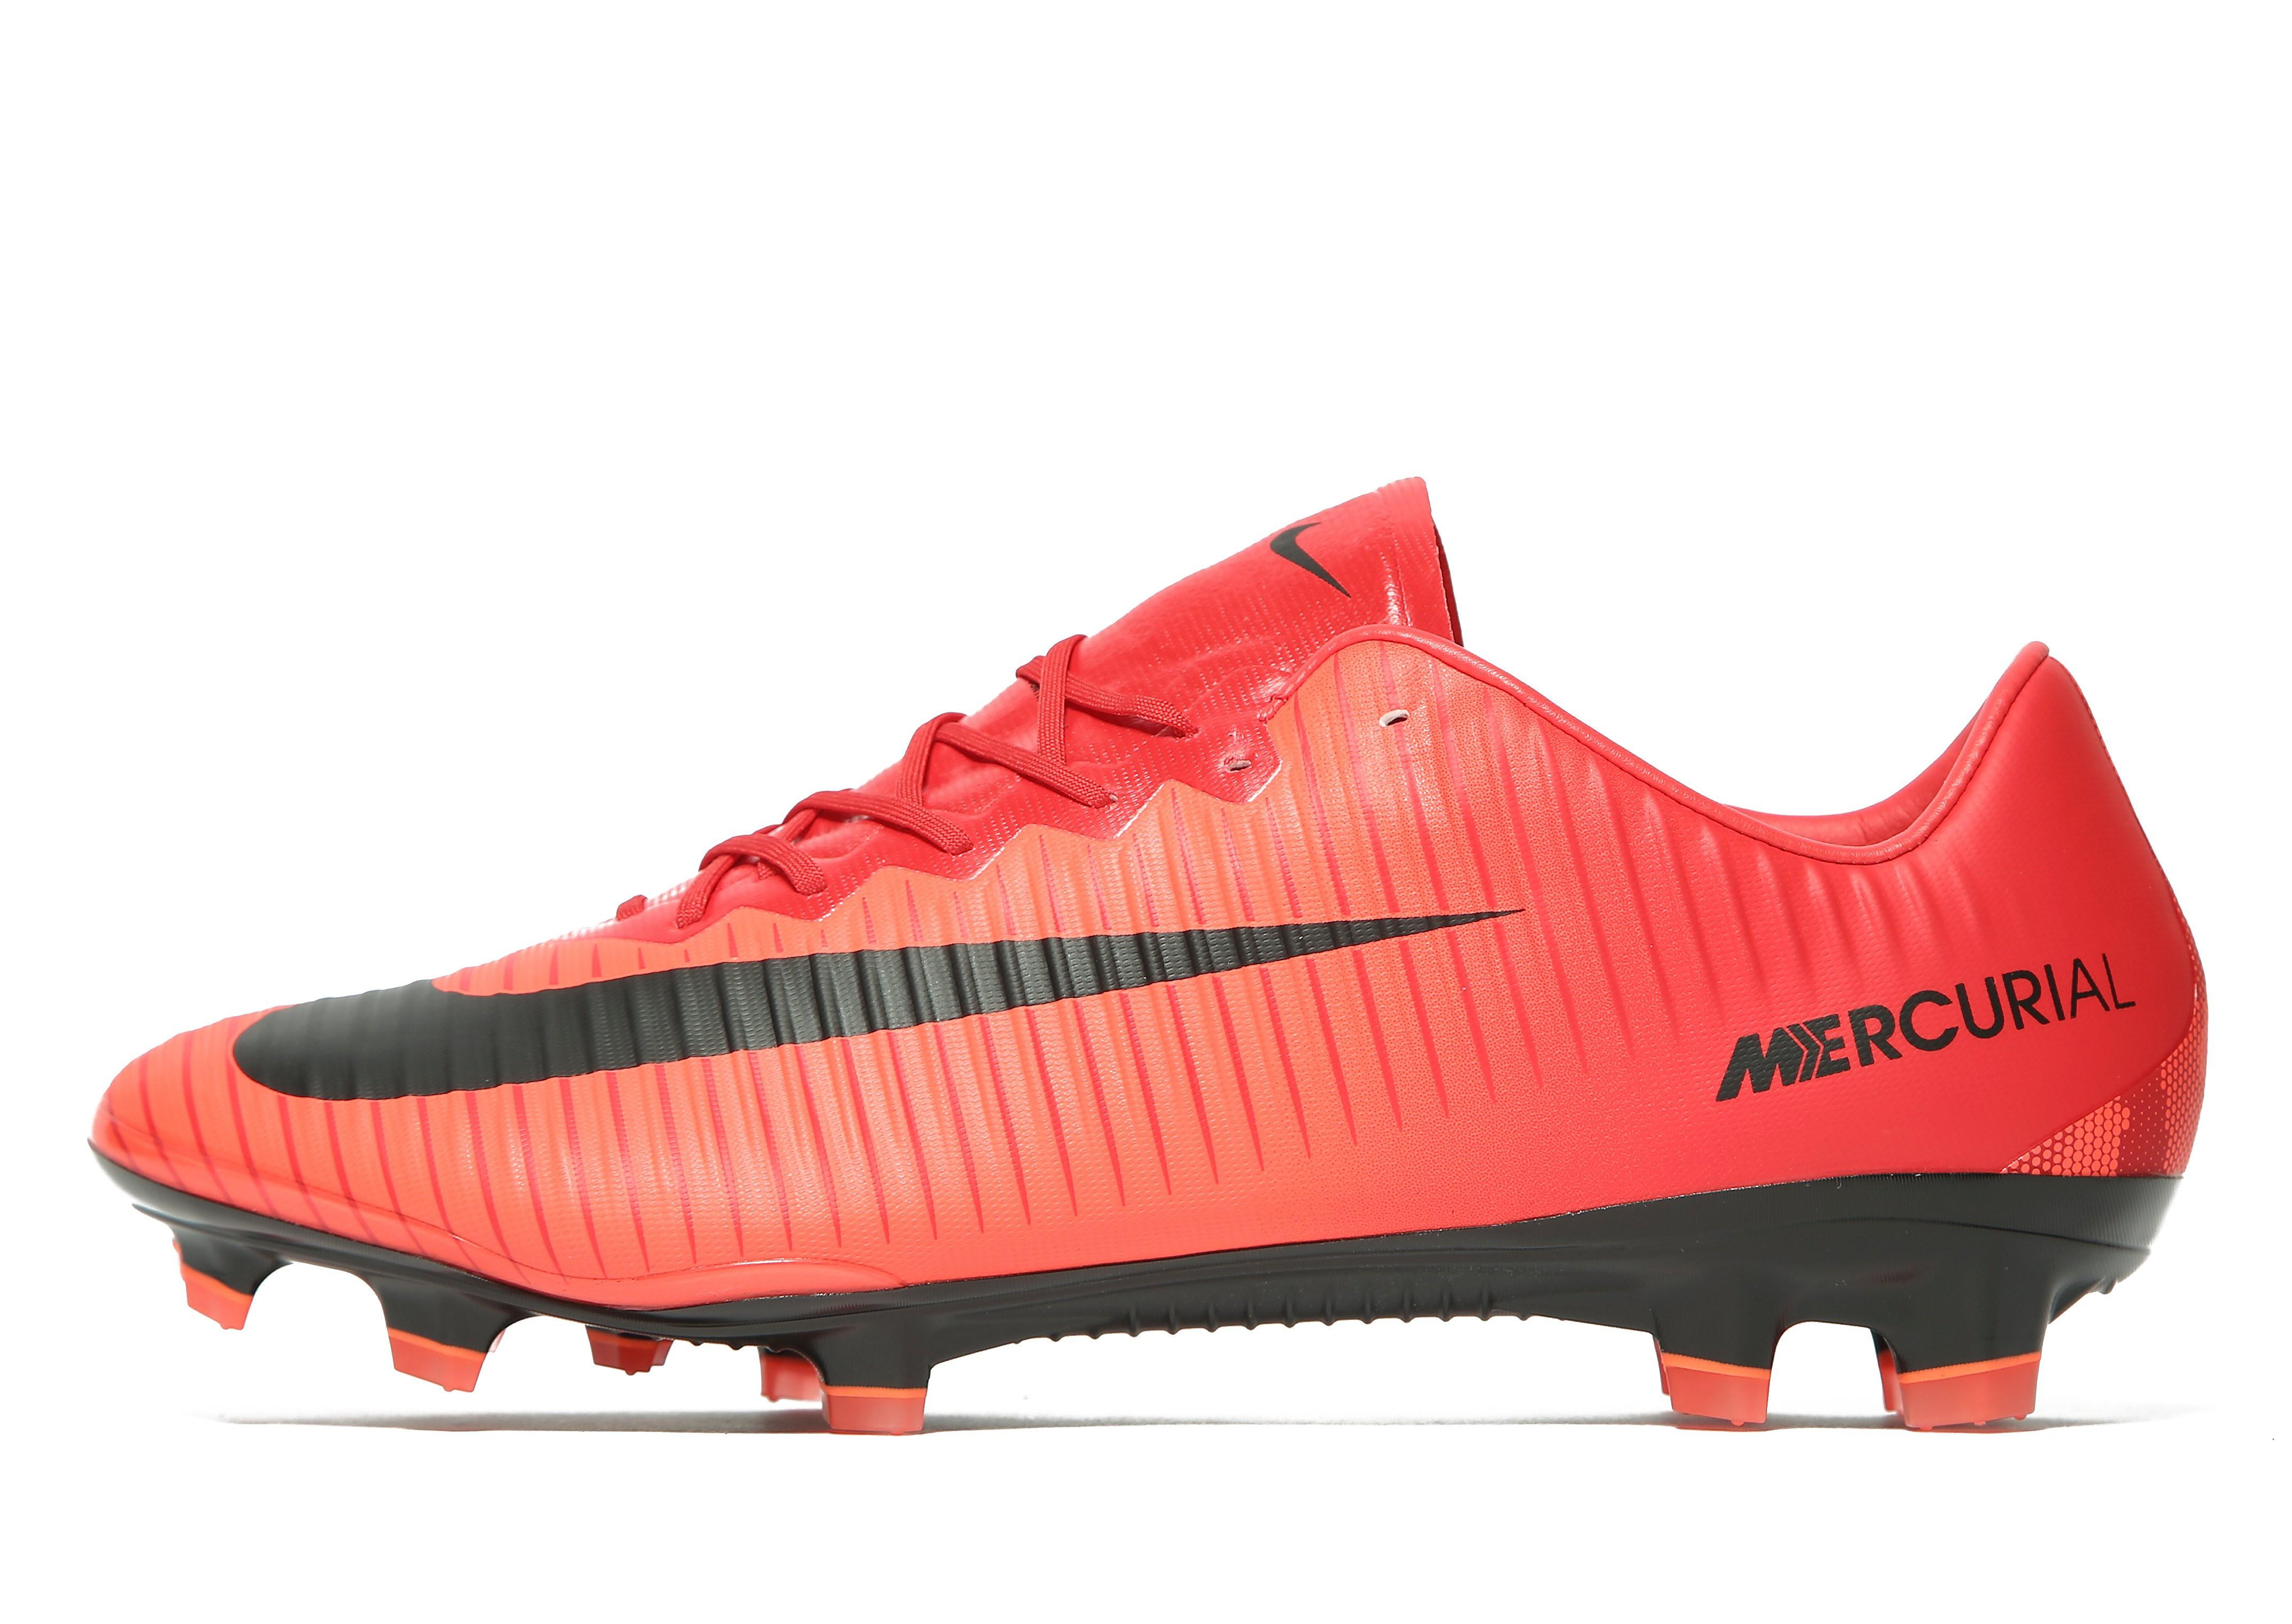 Nike Fire & Ice Mercurial Vapor FG